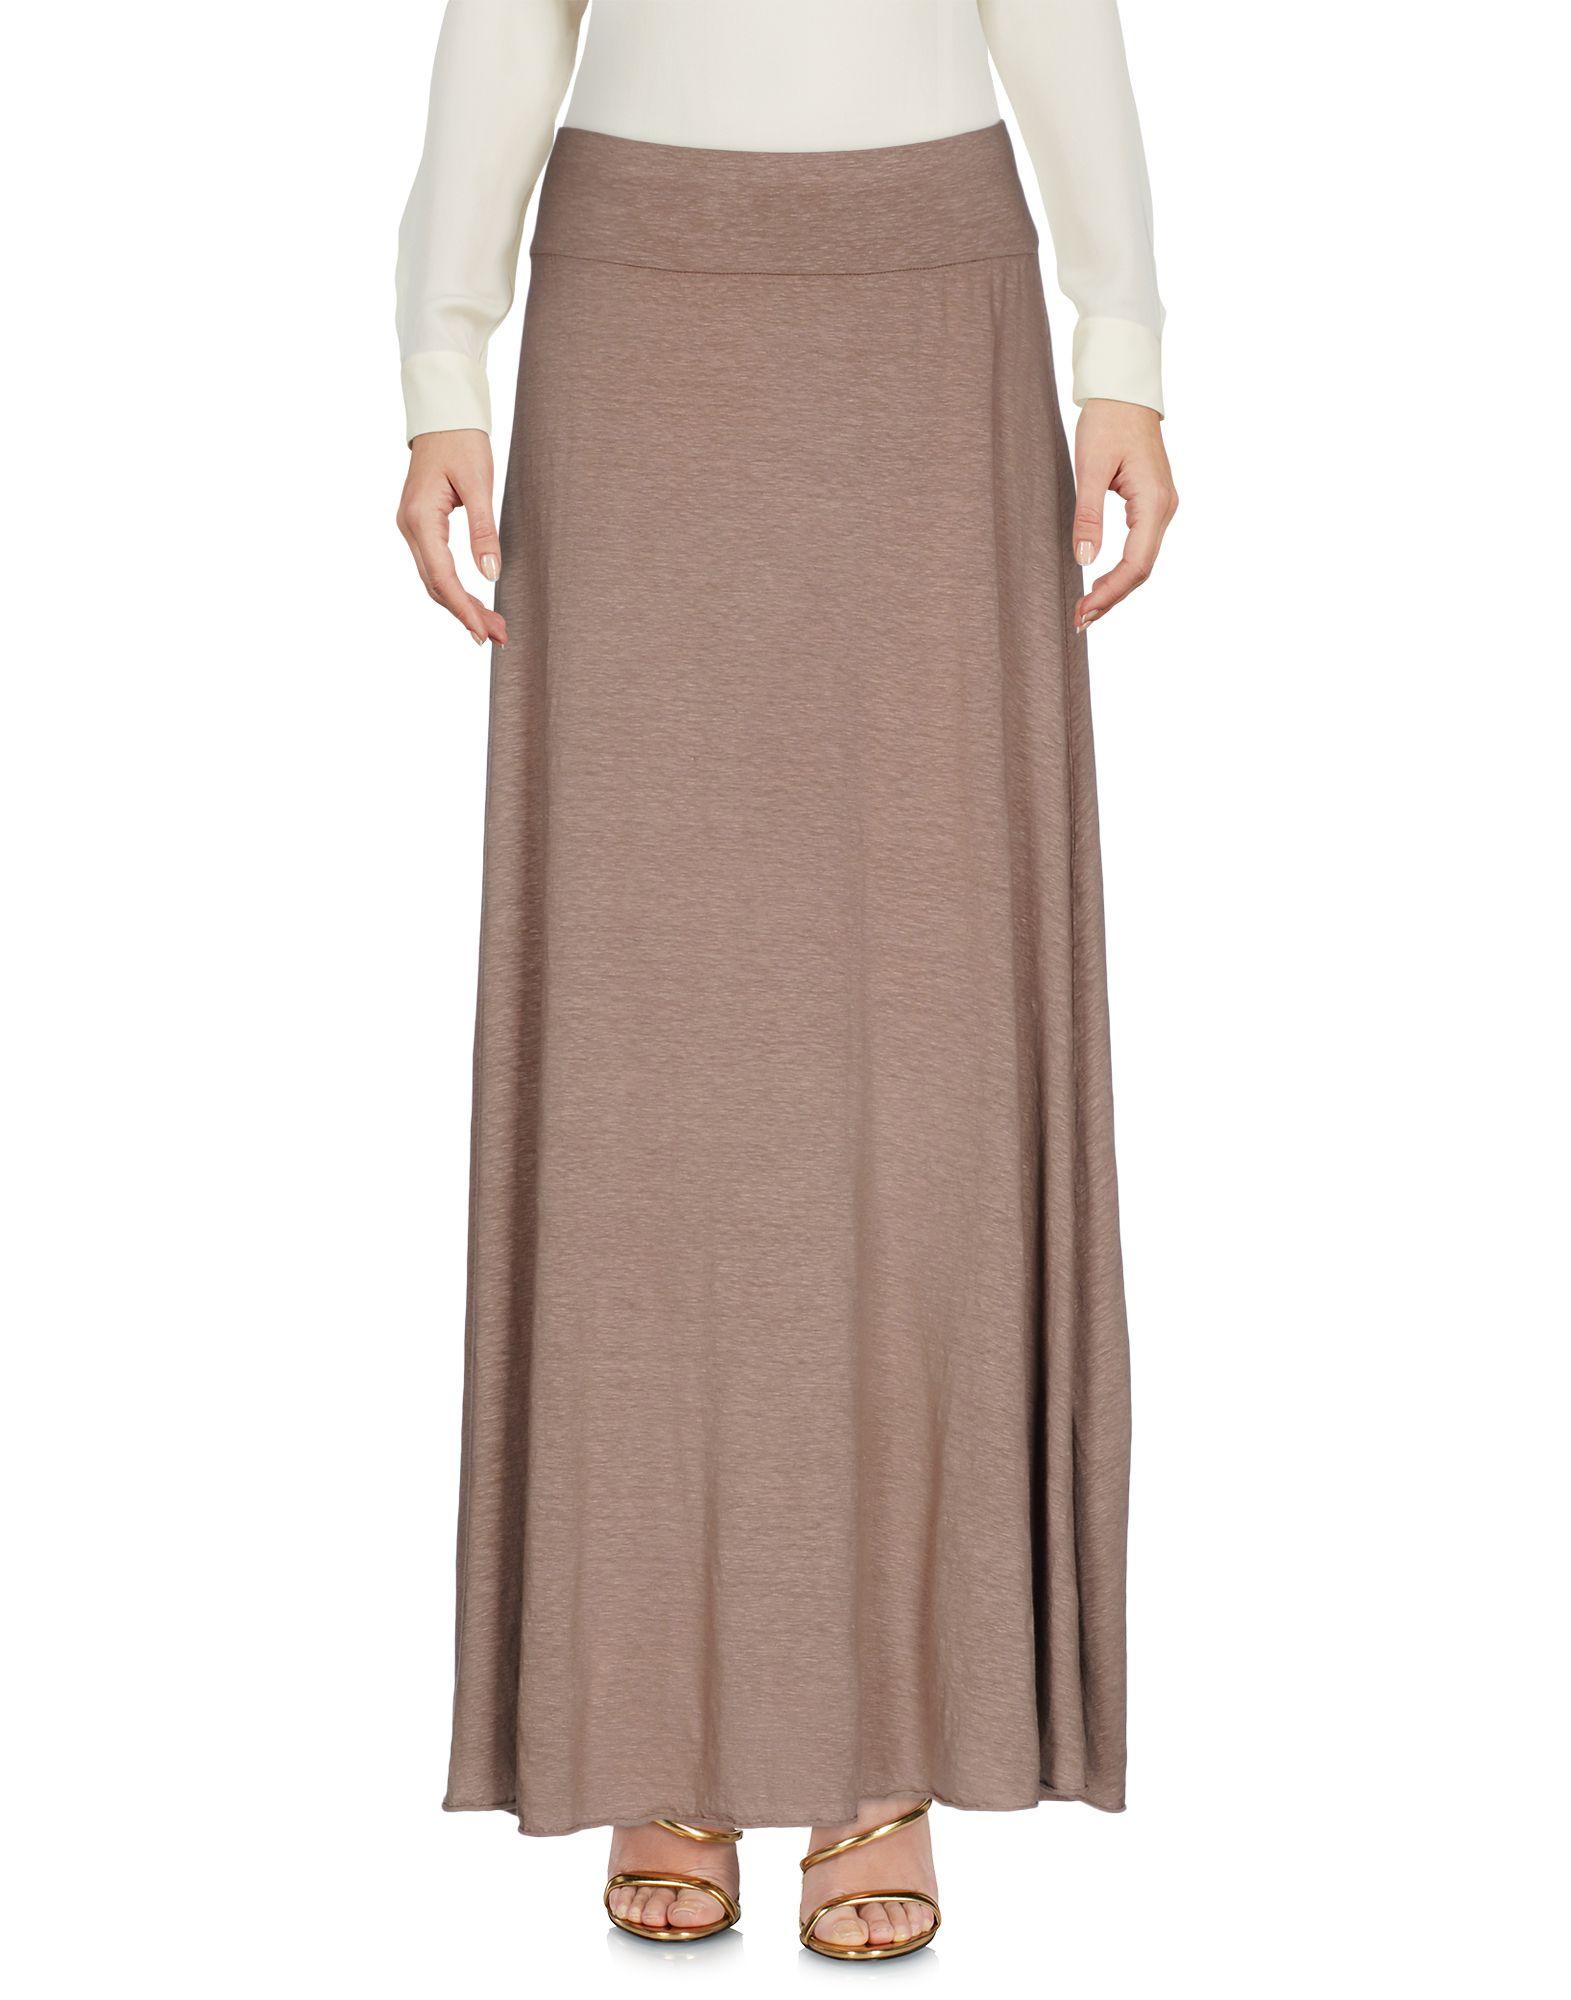 LABO.ART Длинная юбка юбка brusnika brusnika br032ewwsq30